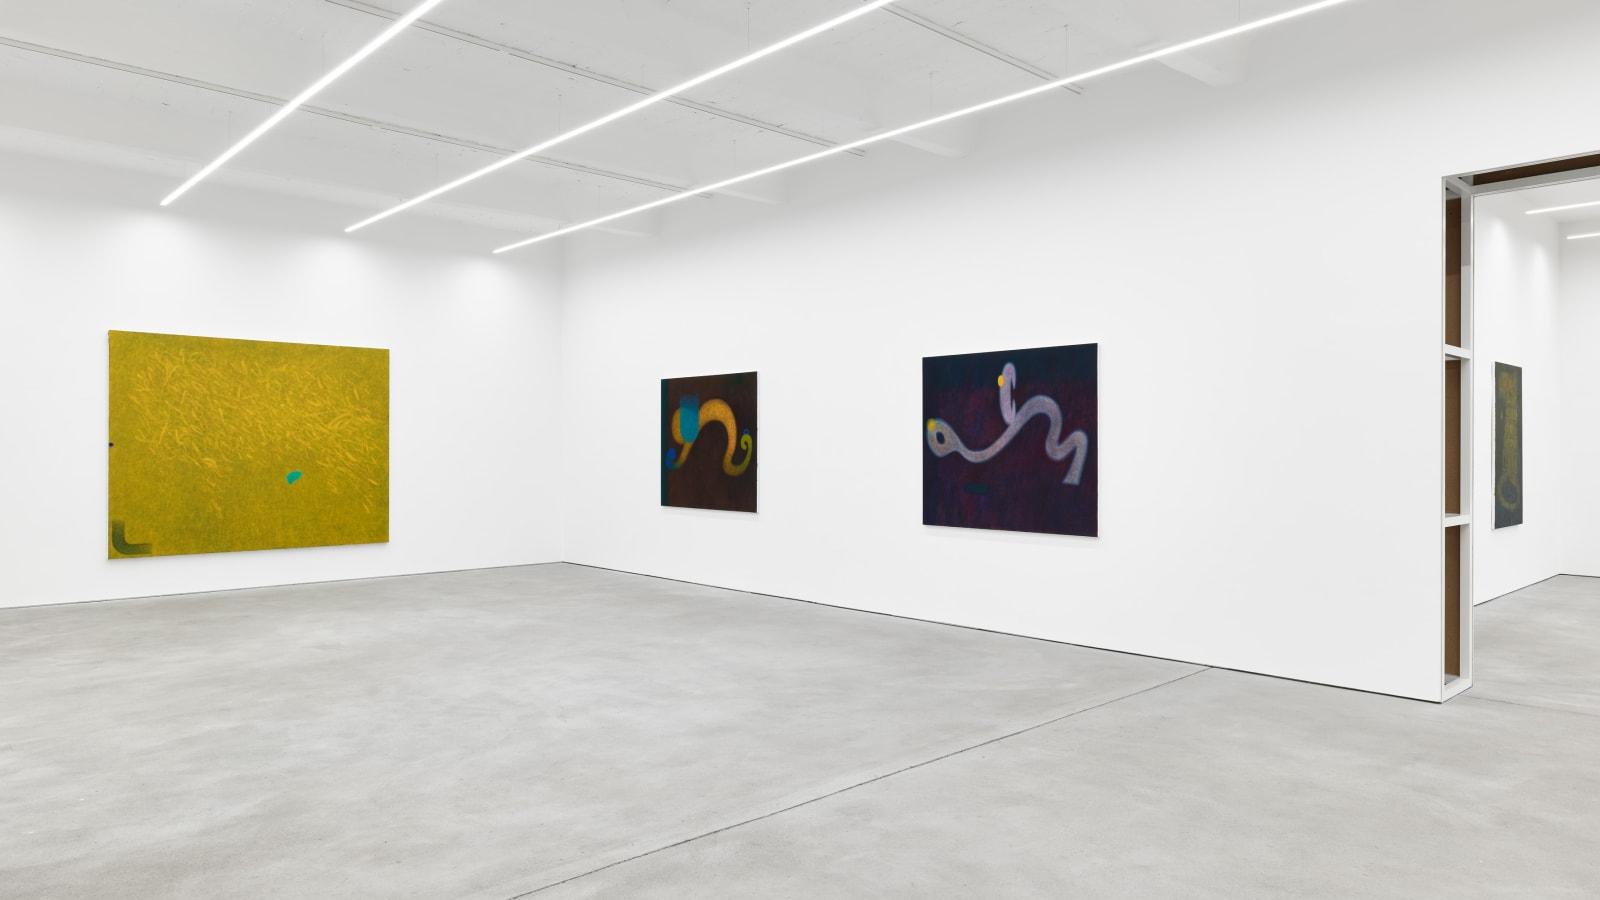 ZHOU SIWEI exhibition view, The Last Bridge, Kraupa-Tuskany Zeidler, Berlin, 2019